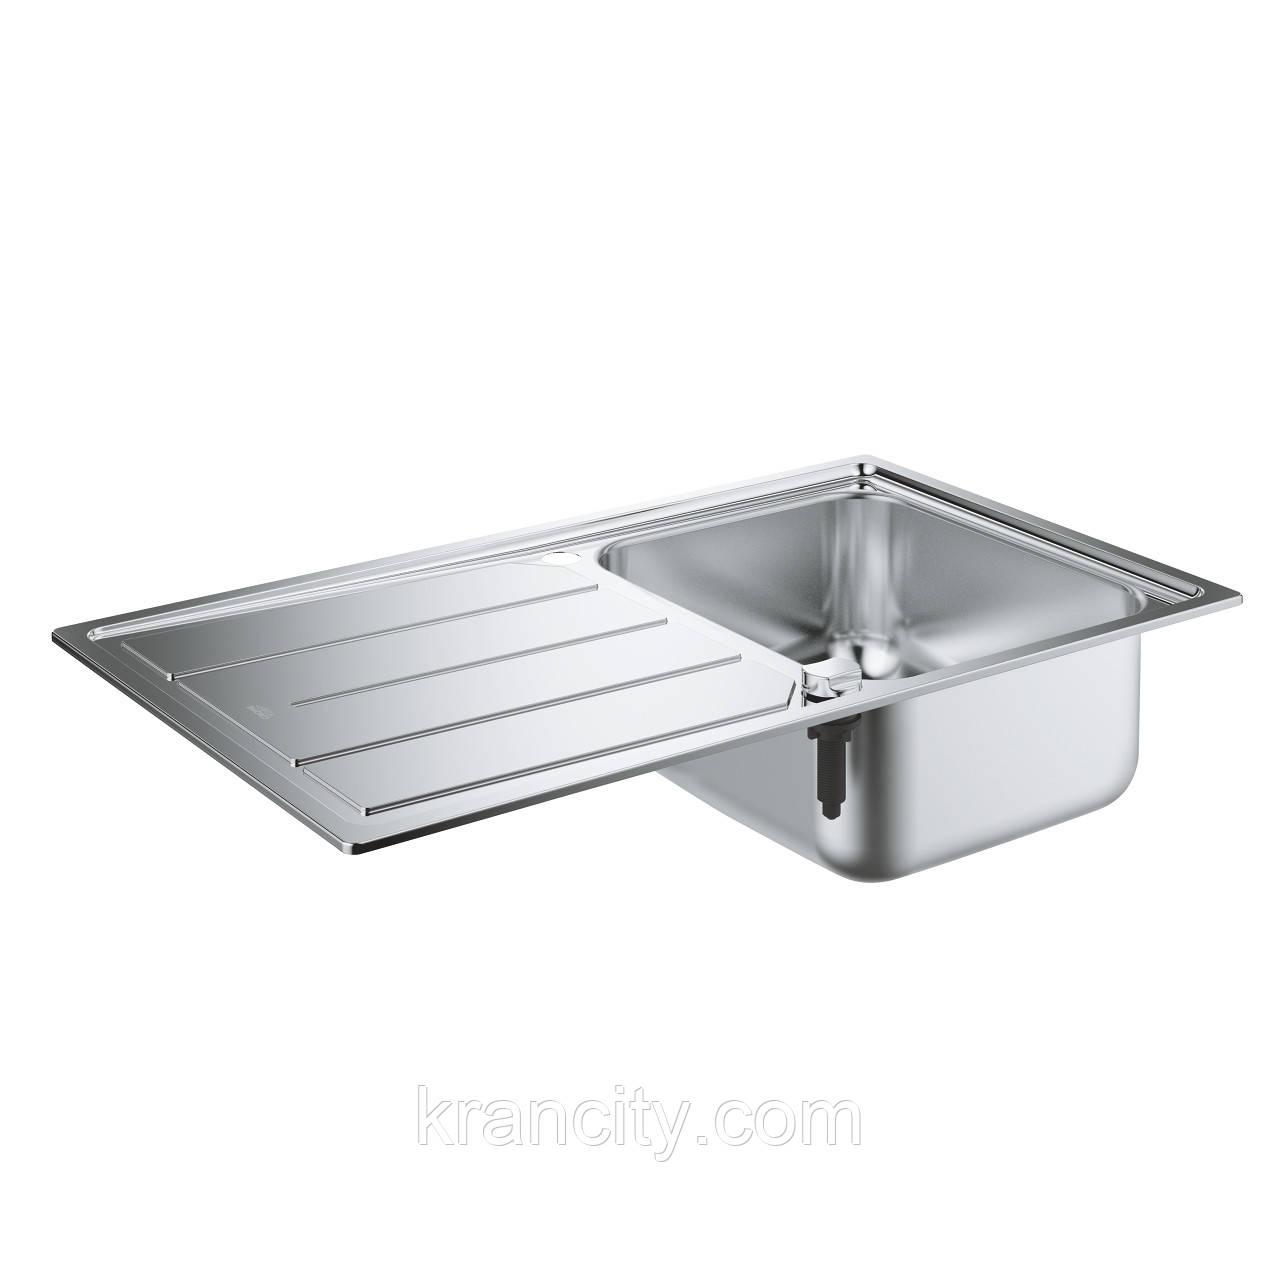 Кухонная мойка K500 Grohe EX Sink 31571SD0,Германия